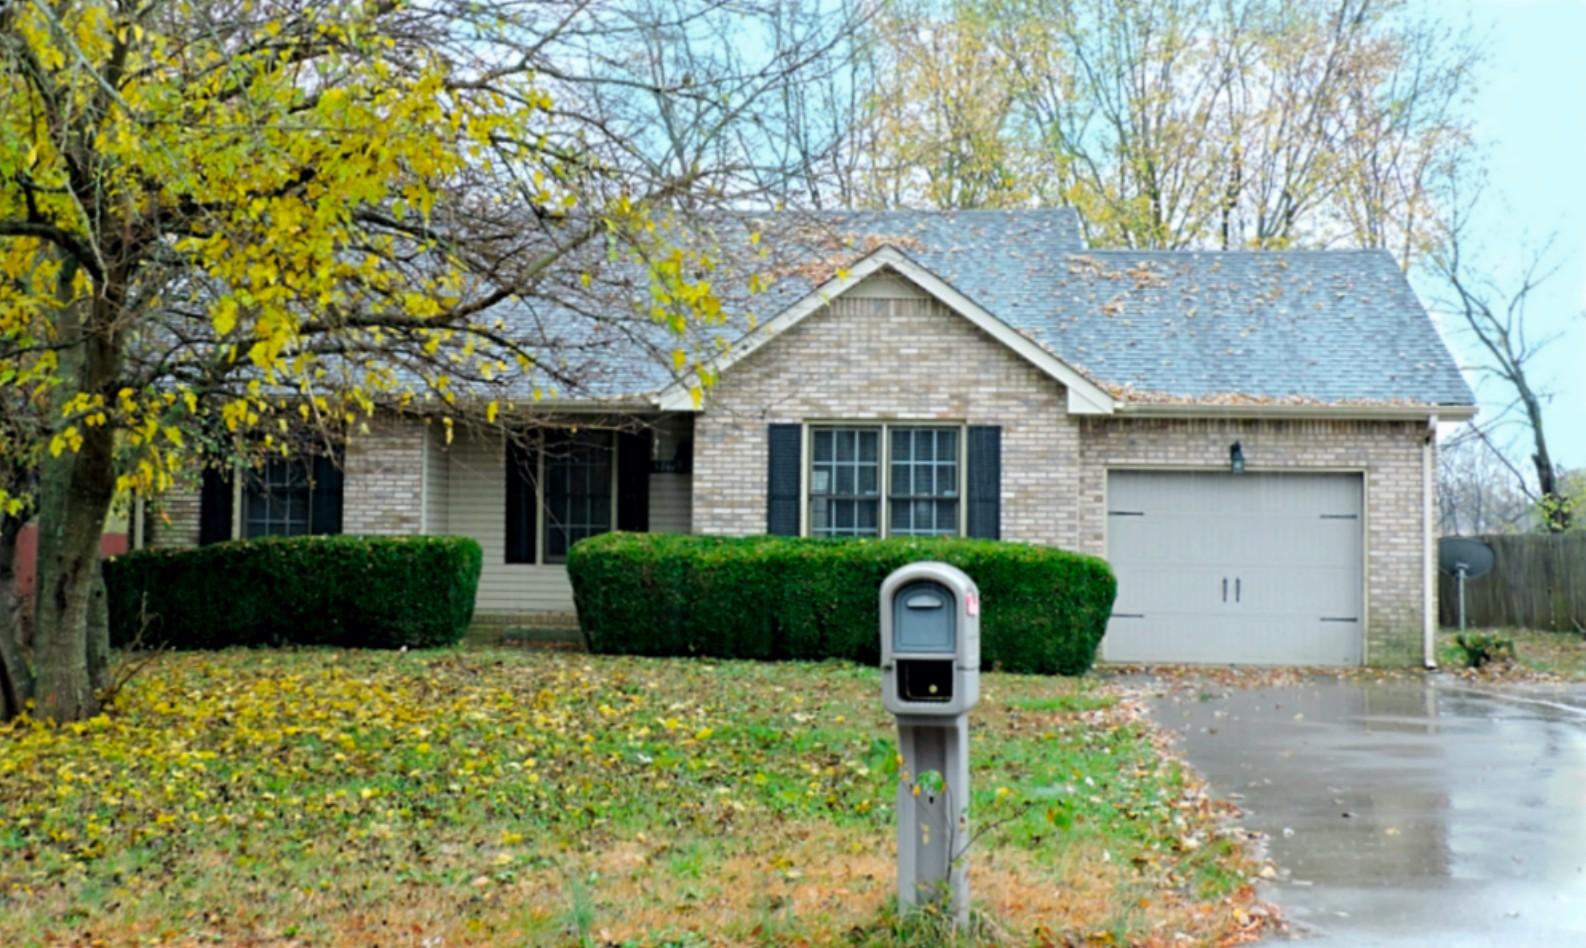 3248 S Senseney Cir Property Photo - Clarksville, TN real estate listing